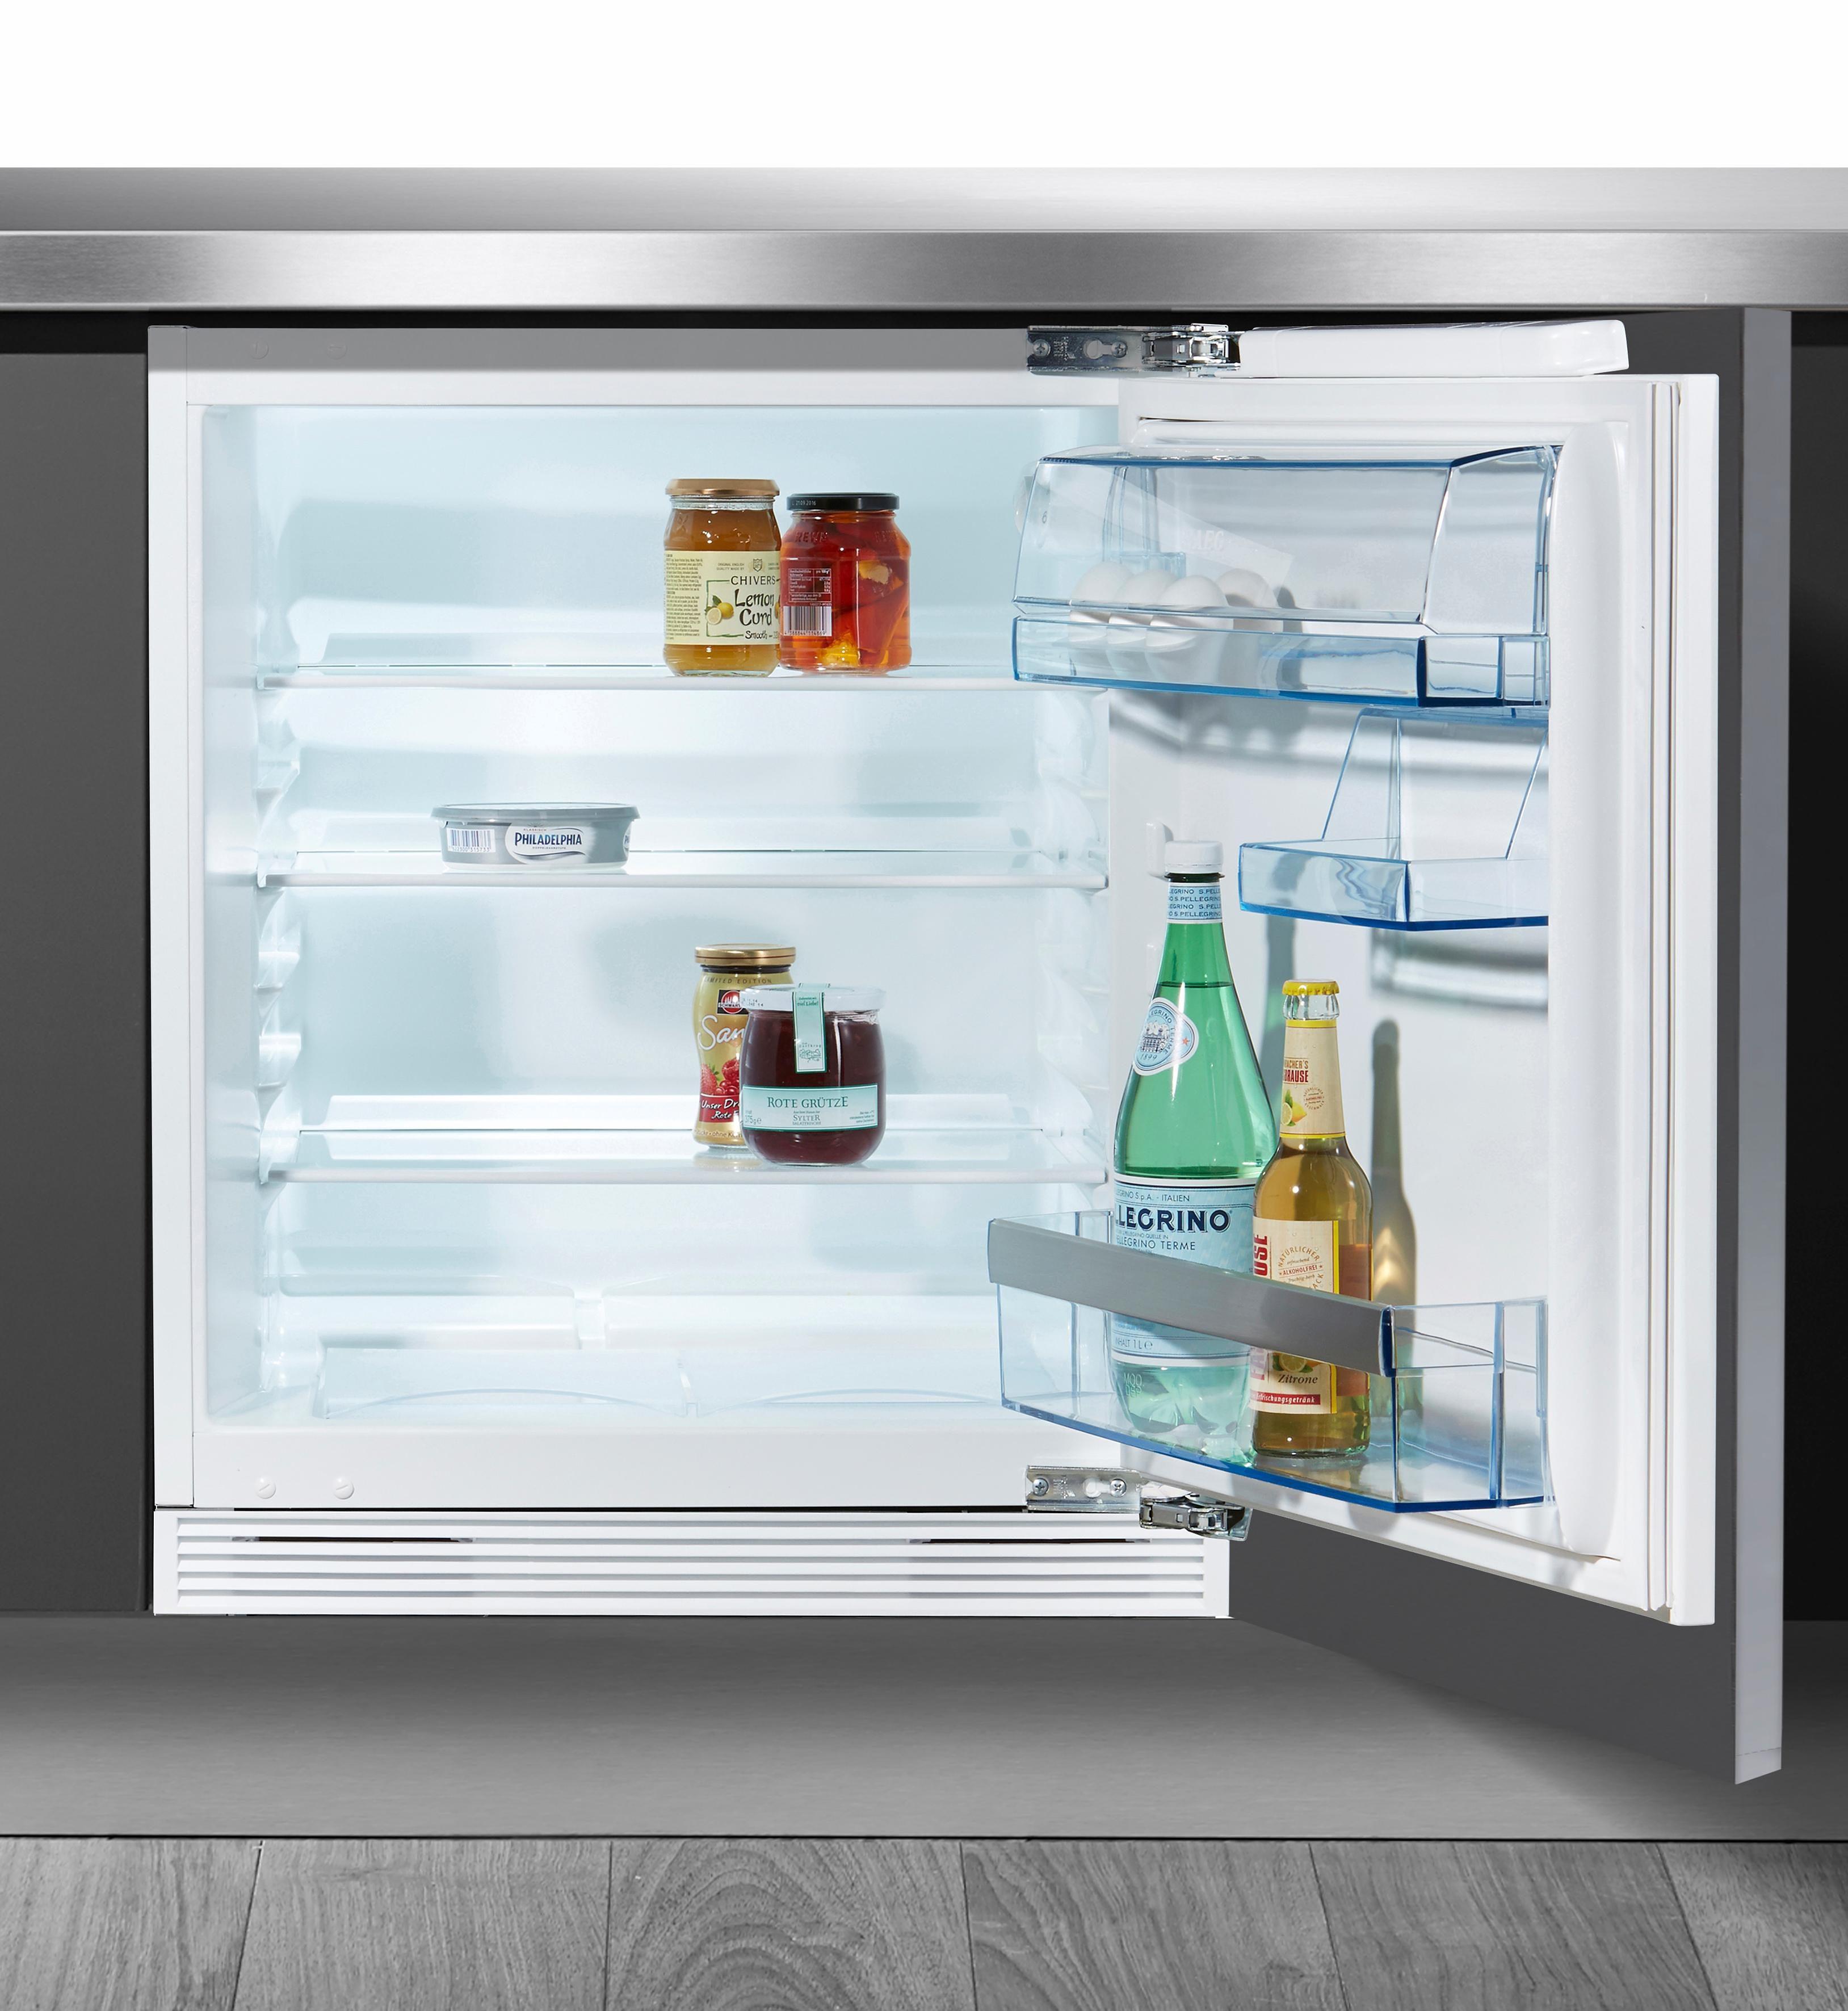 AEG Unterbau Kühlschrank integrierbar SANTO / SKS58200F0, Energieklasse A+